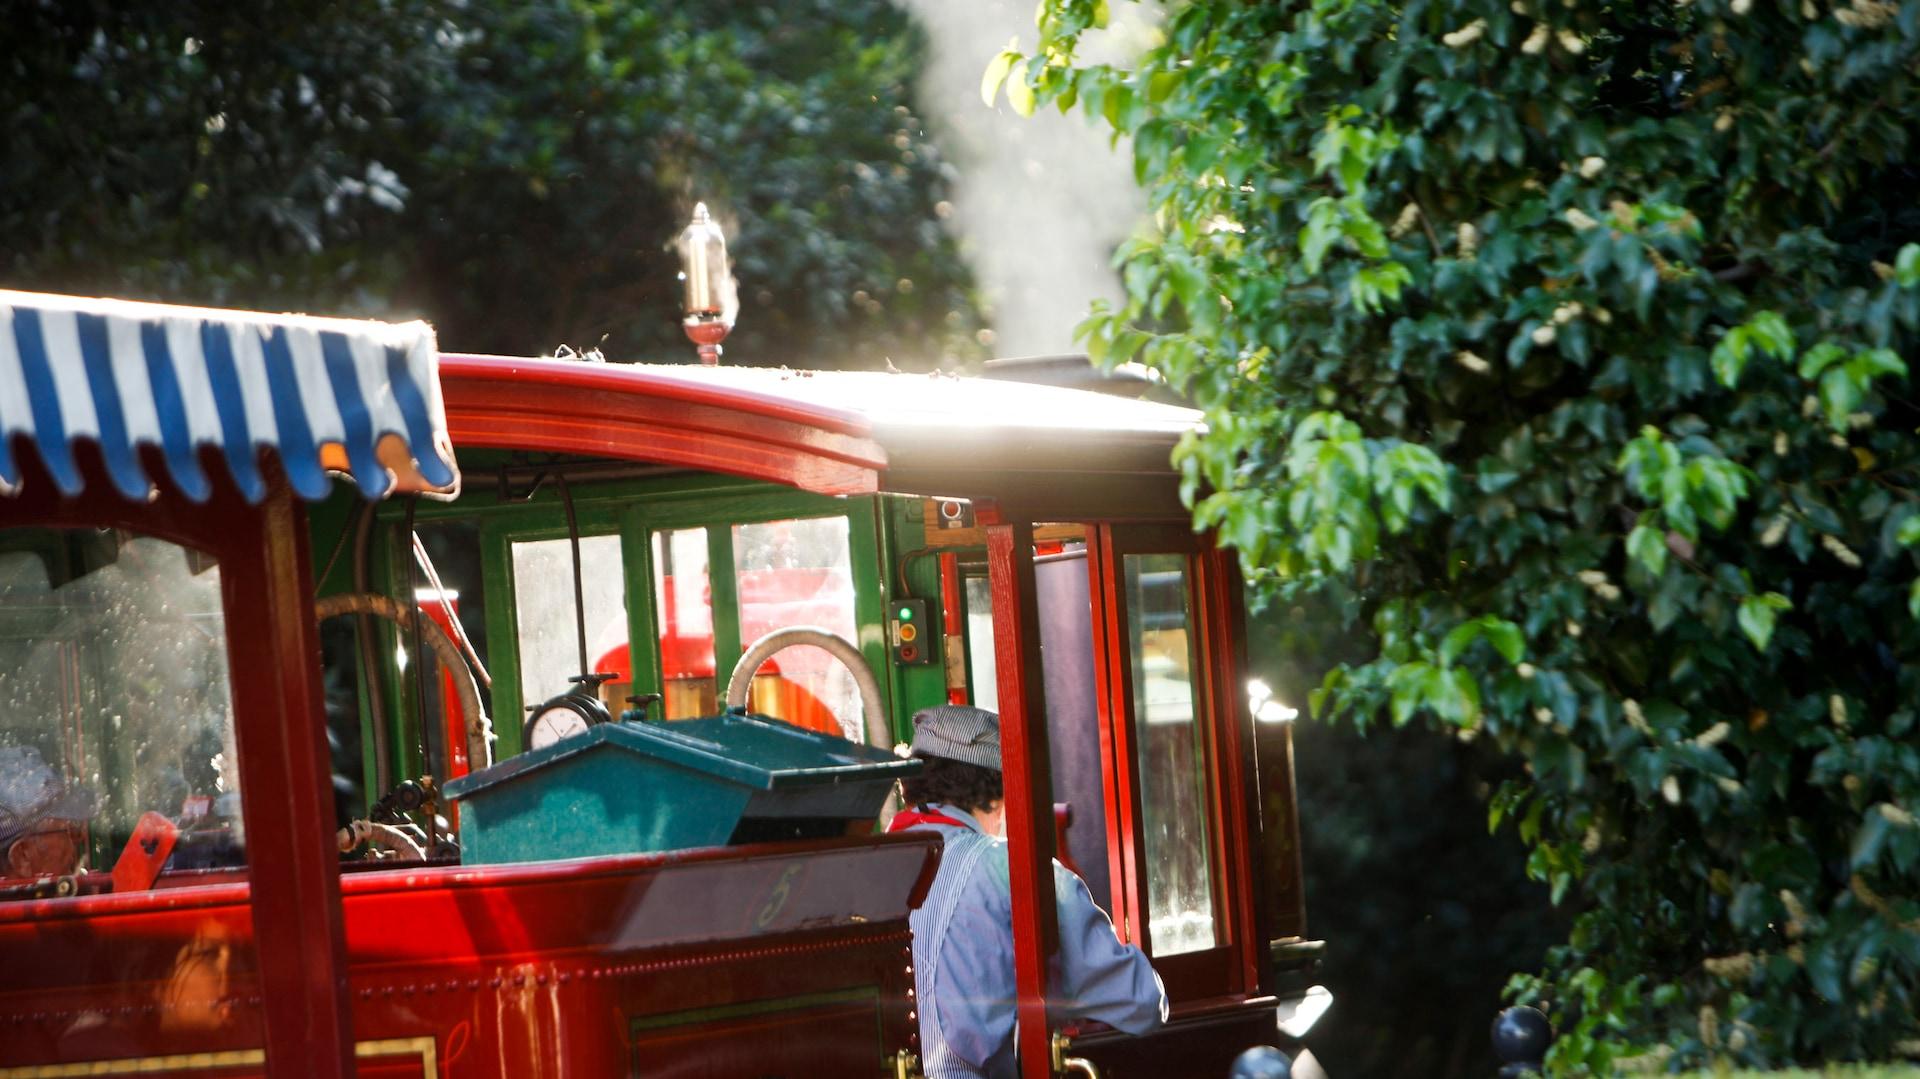 Disneyland Railroad | Disneyland Resort